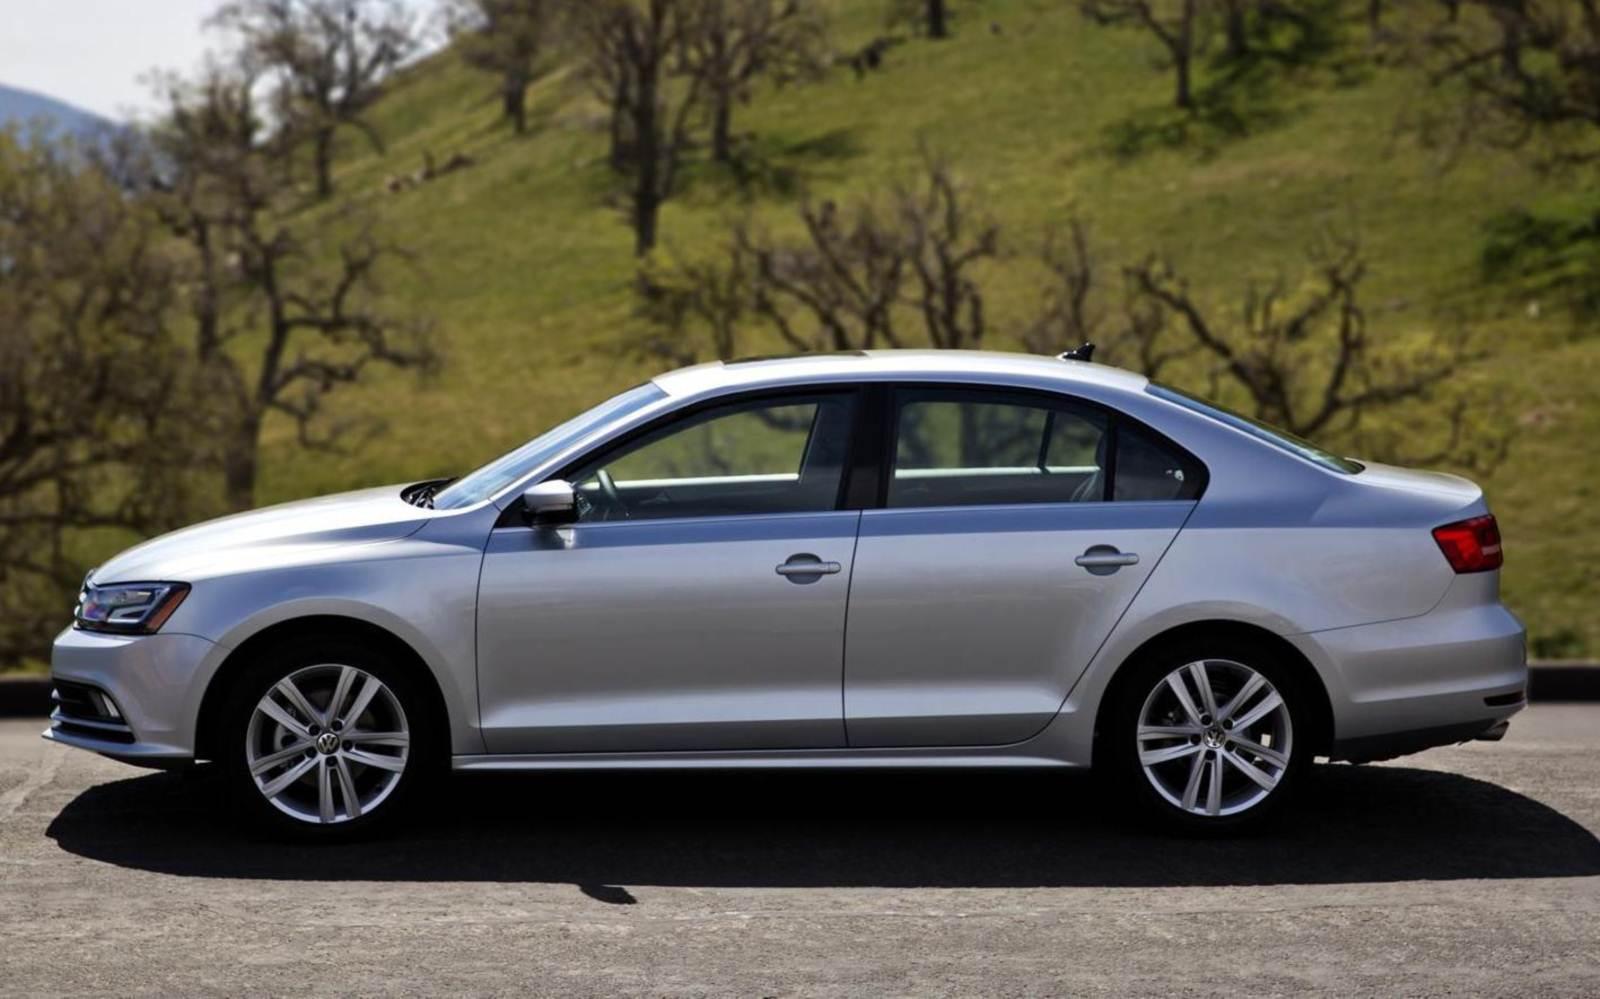 Novo Volkswagen Jetta 2015 - lateral